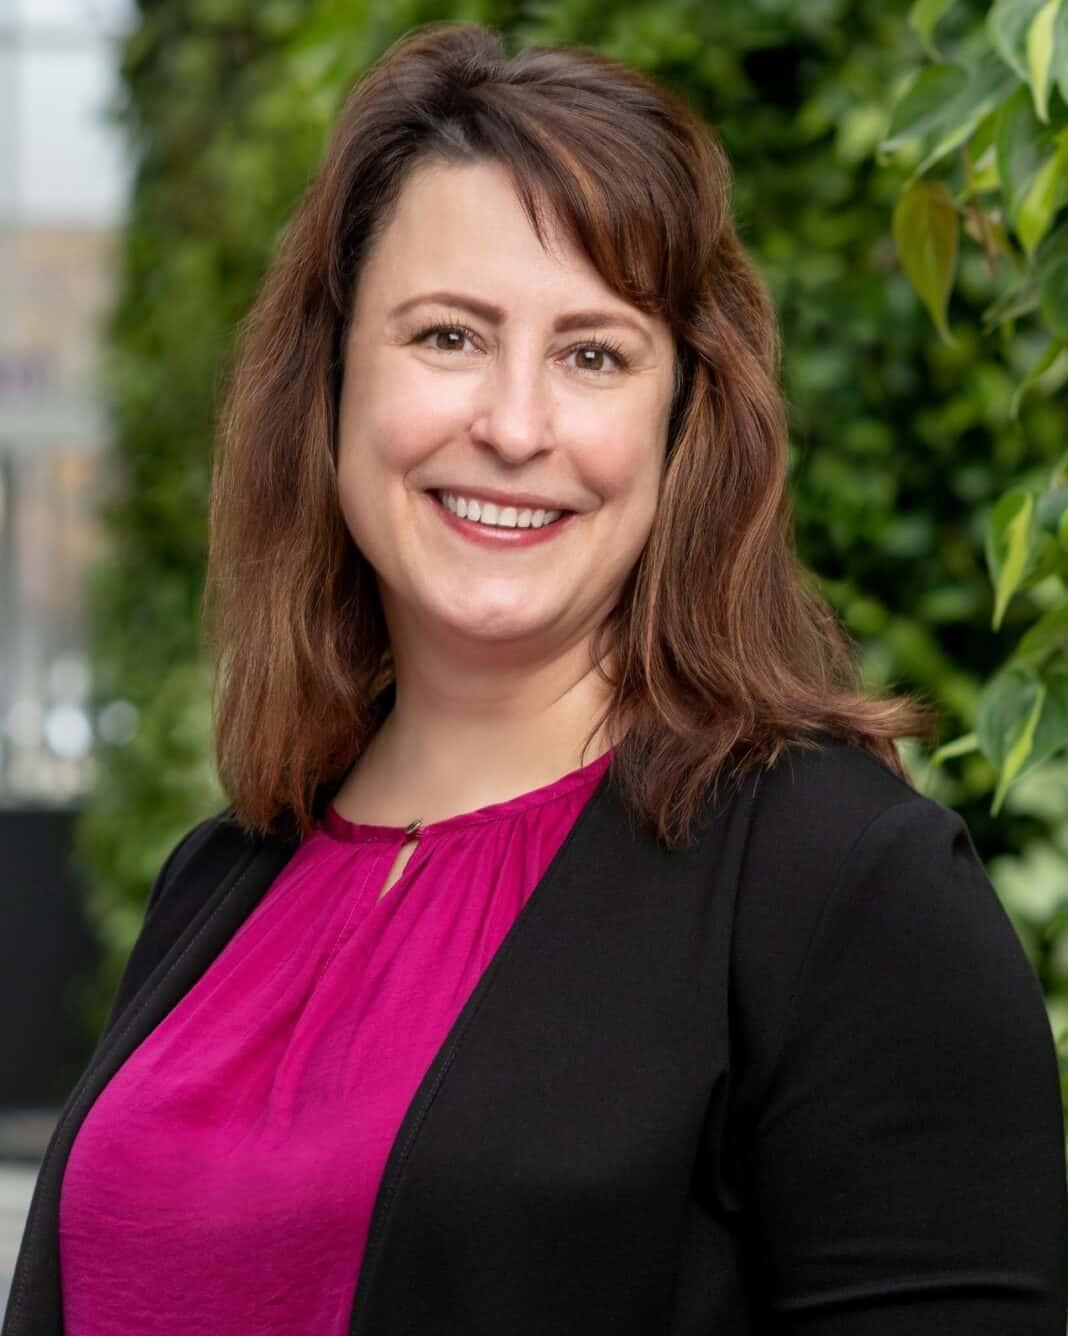 Angie Achenbach